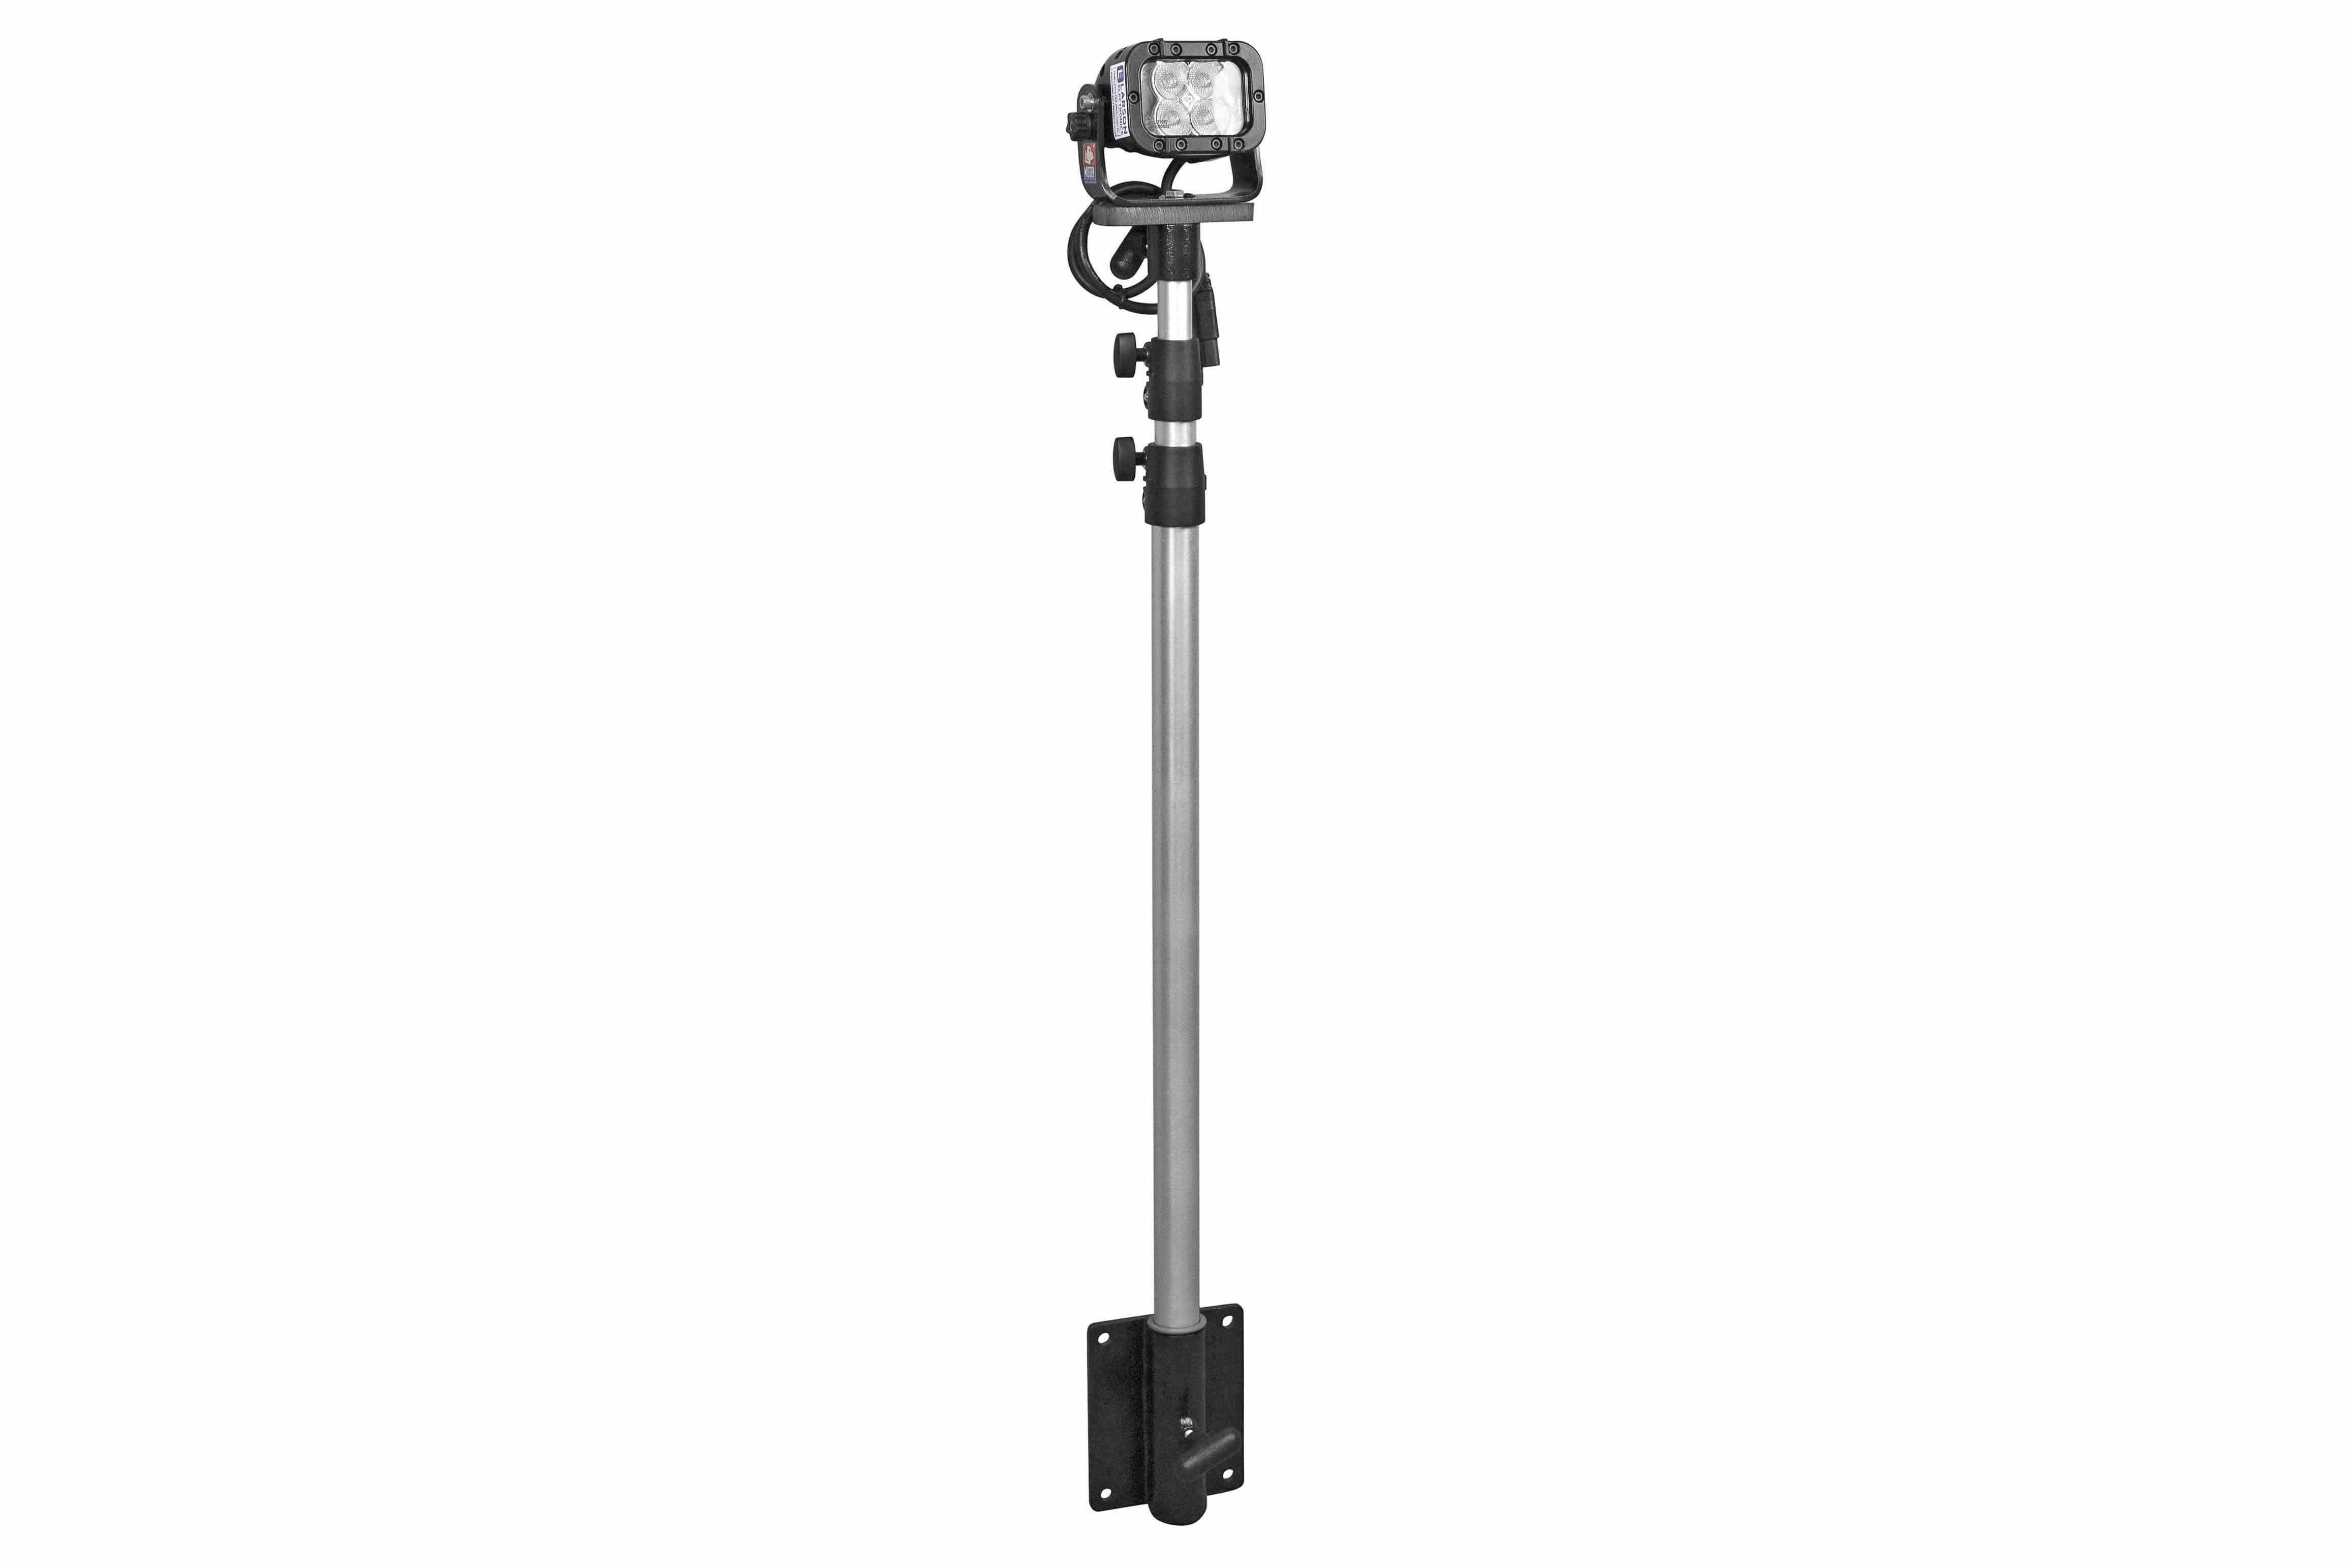 12 Watt Portable Led Telescoping Light Pole